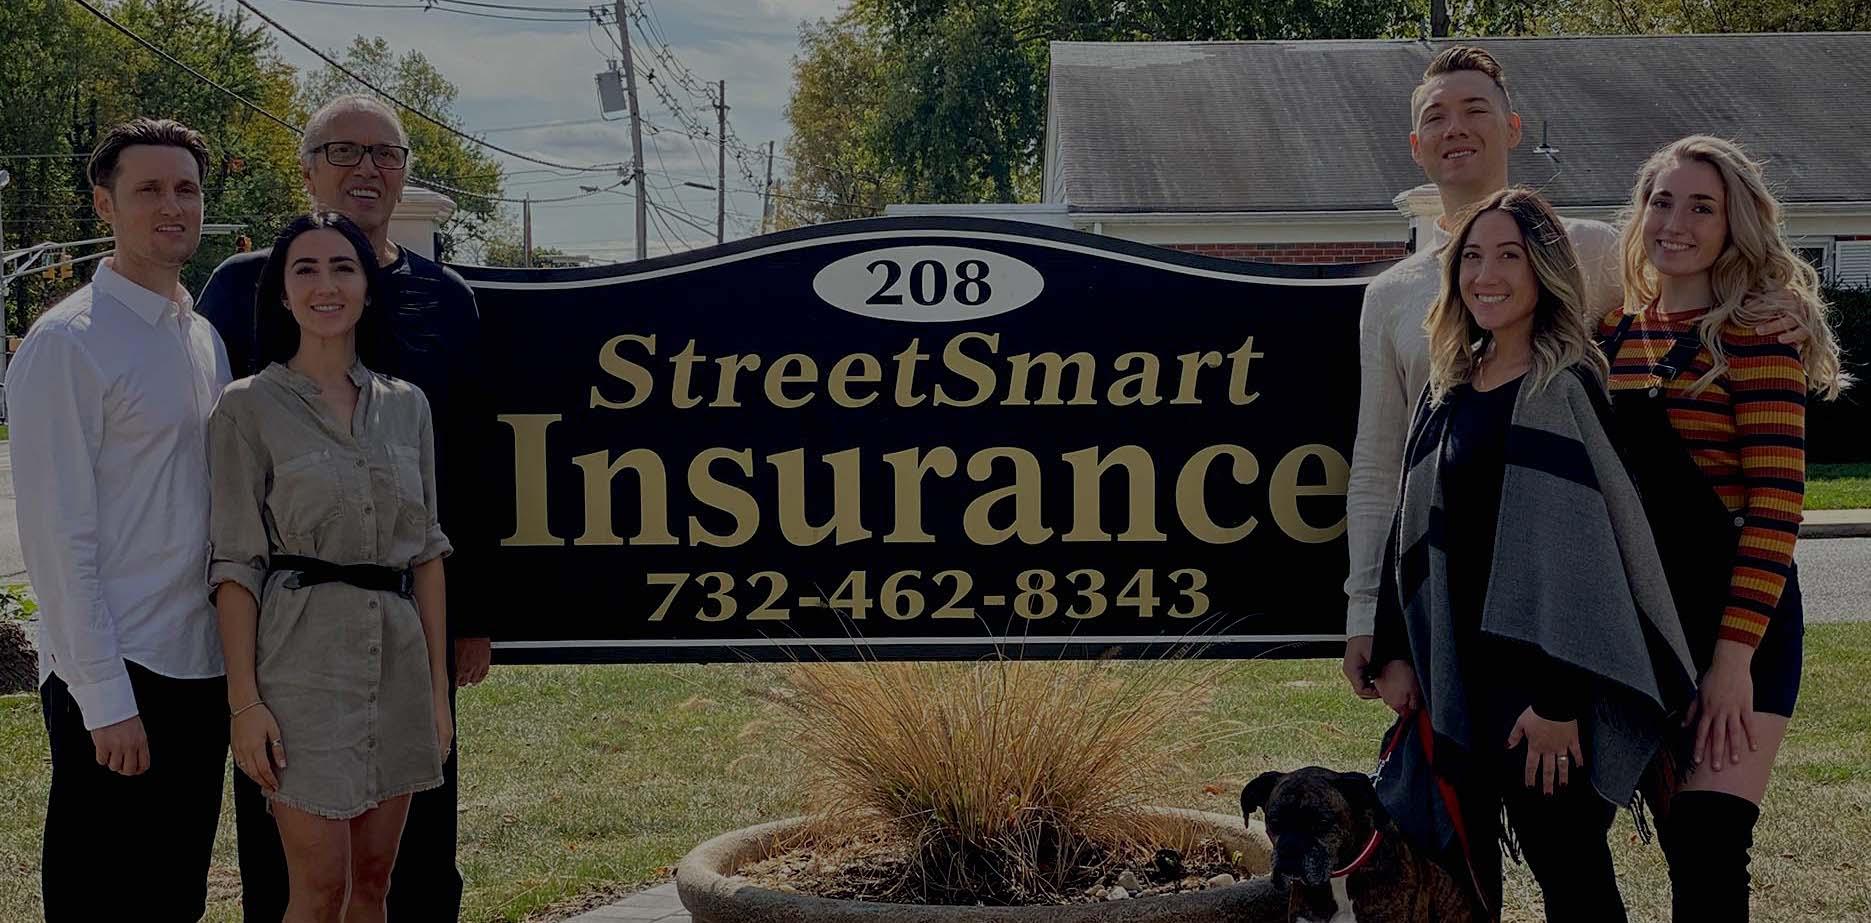 freehold nj insurance agency